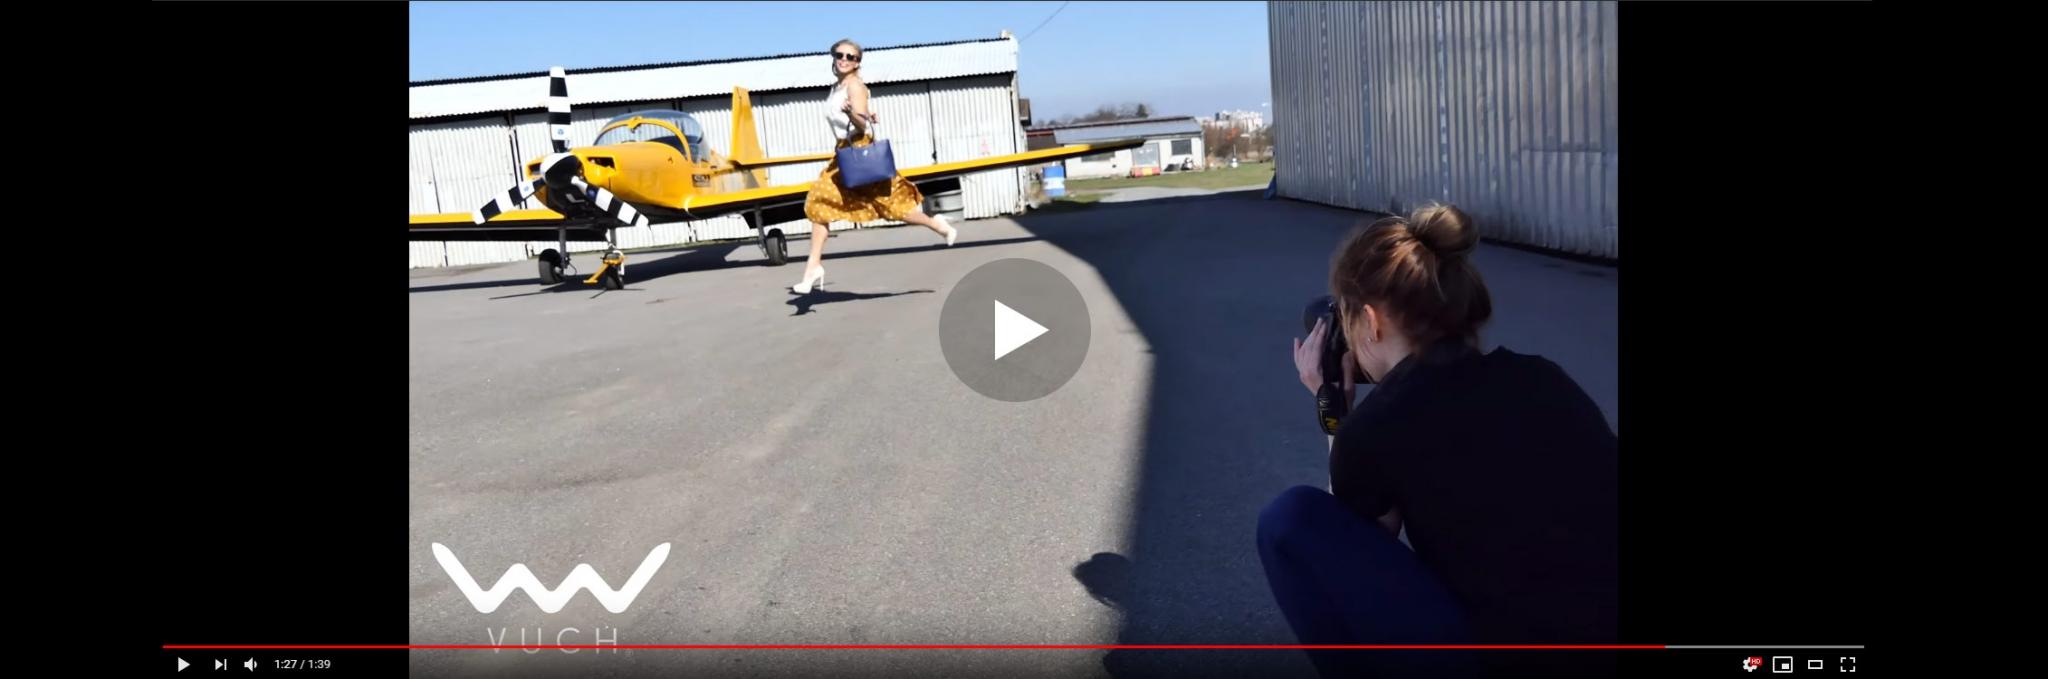 video Vuch